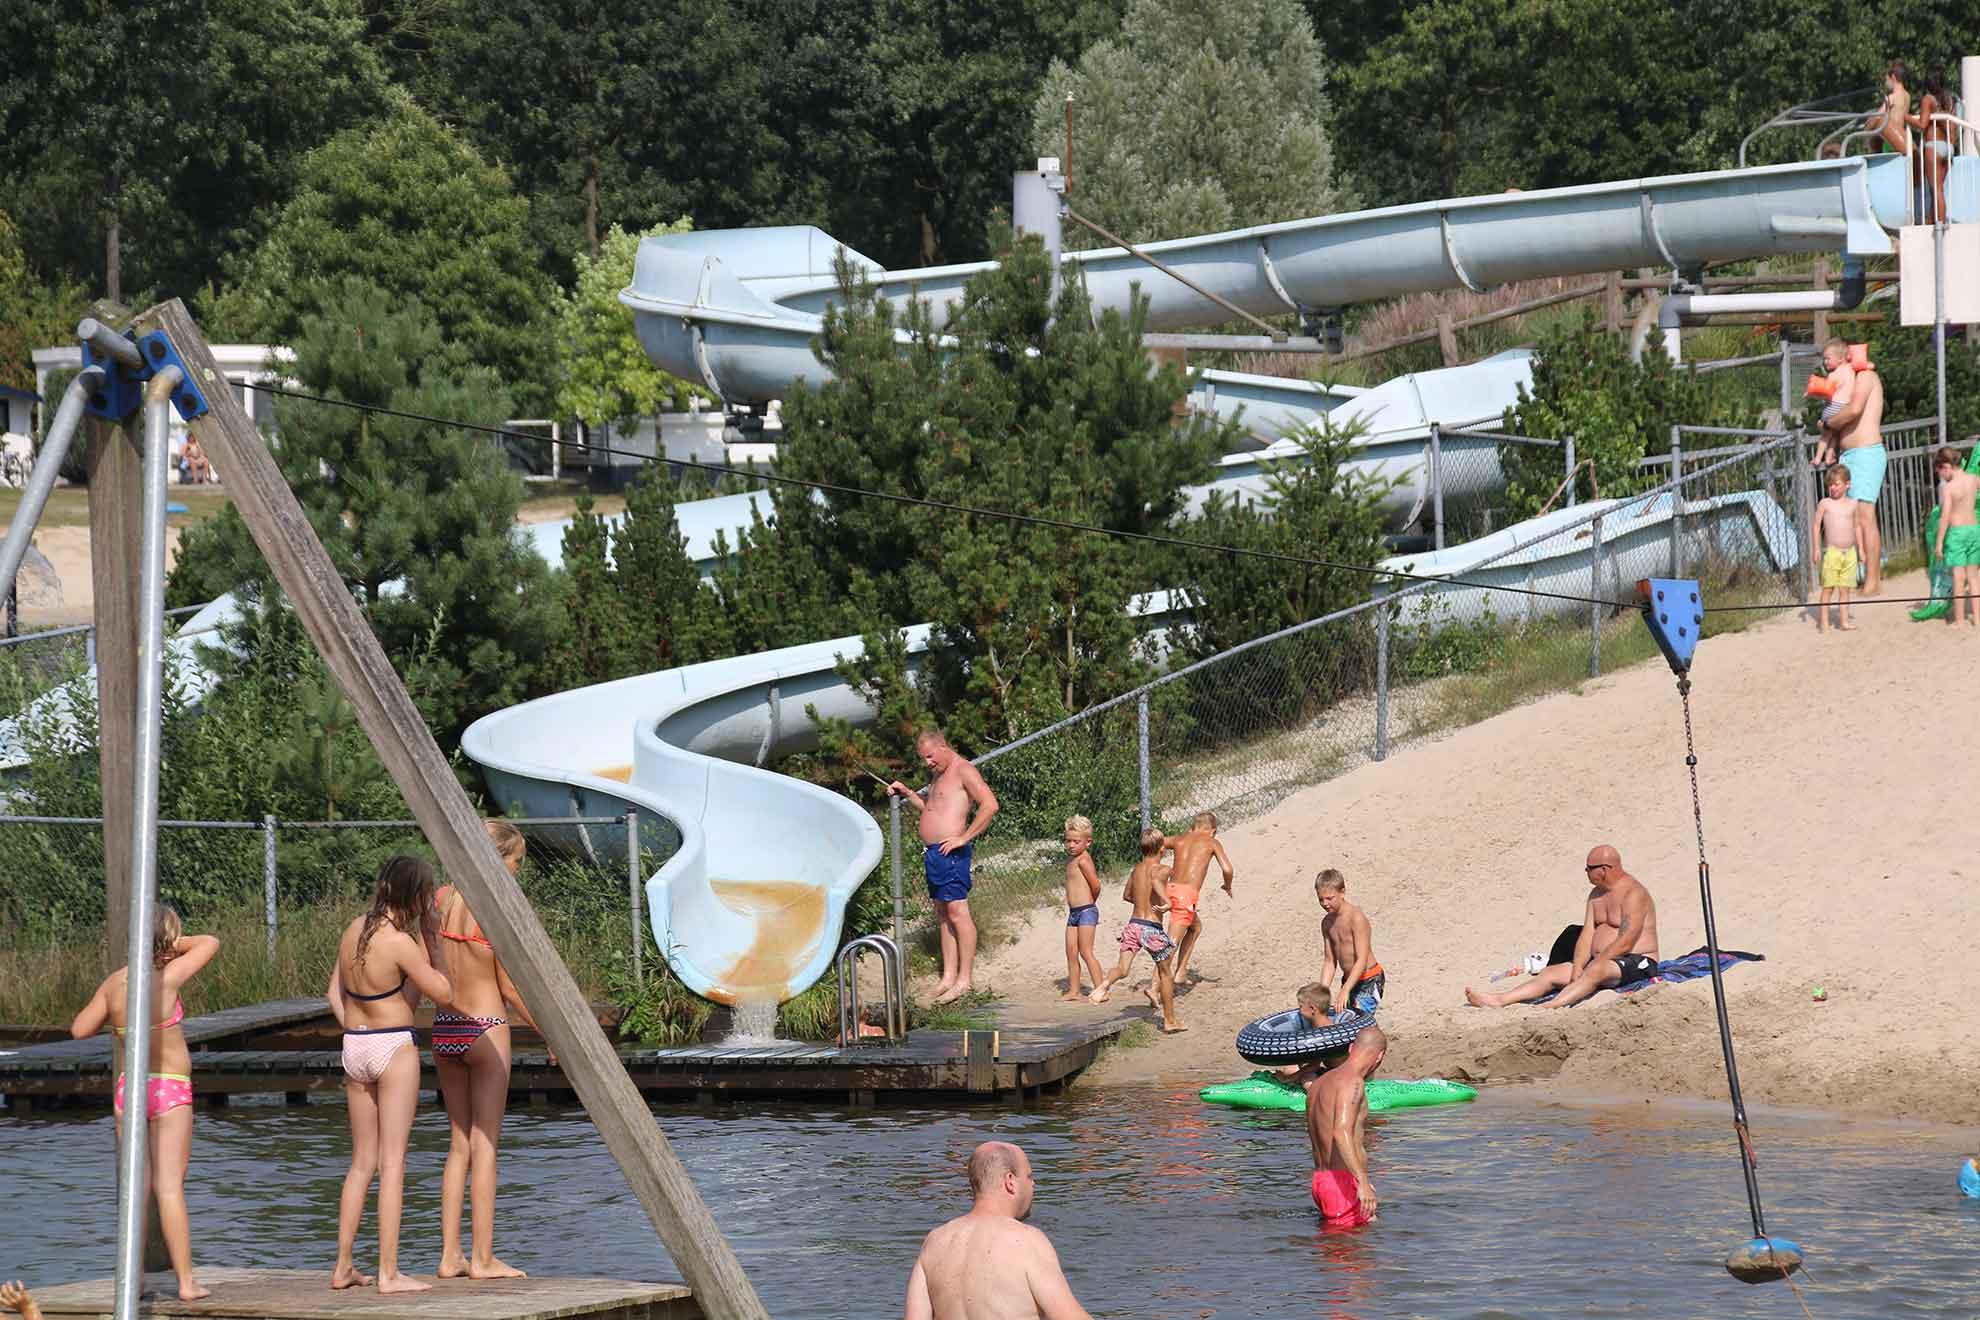 Mobilheime mieten in Overijssel auf 5 Sterne Ferienpark - Mobilheime mieten in Overijssel